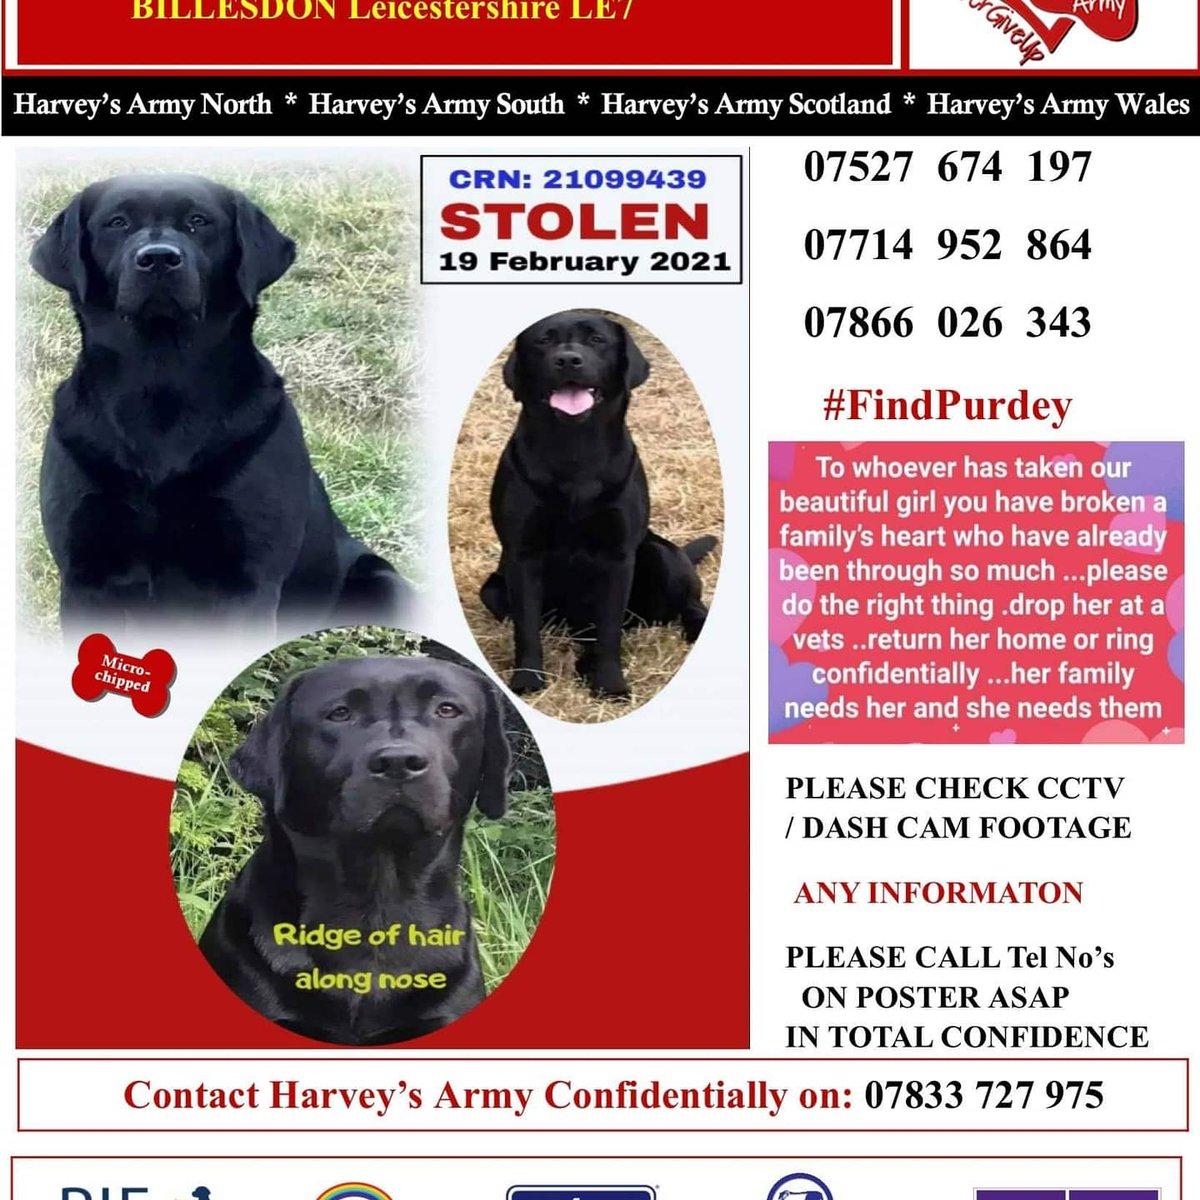 ‼️URGENT RETWEETS ‼️ #stolen #Leicestershire 19.02.21 💔 12 weeks of complete and utter devastation.  #Sheneedstobehome  pls help! If you know something.. say something! #FindPurdey